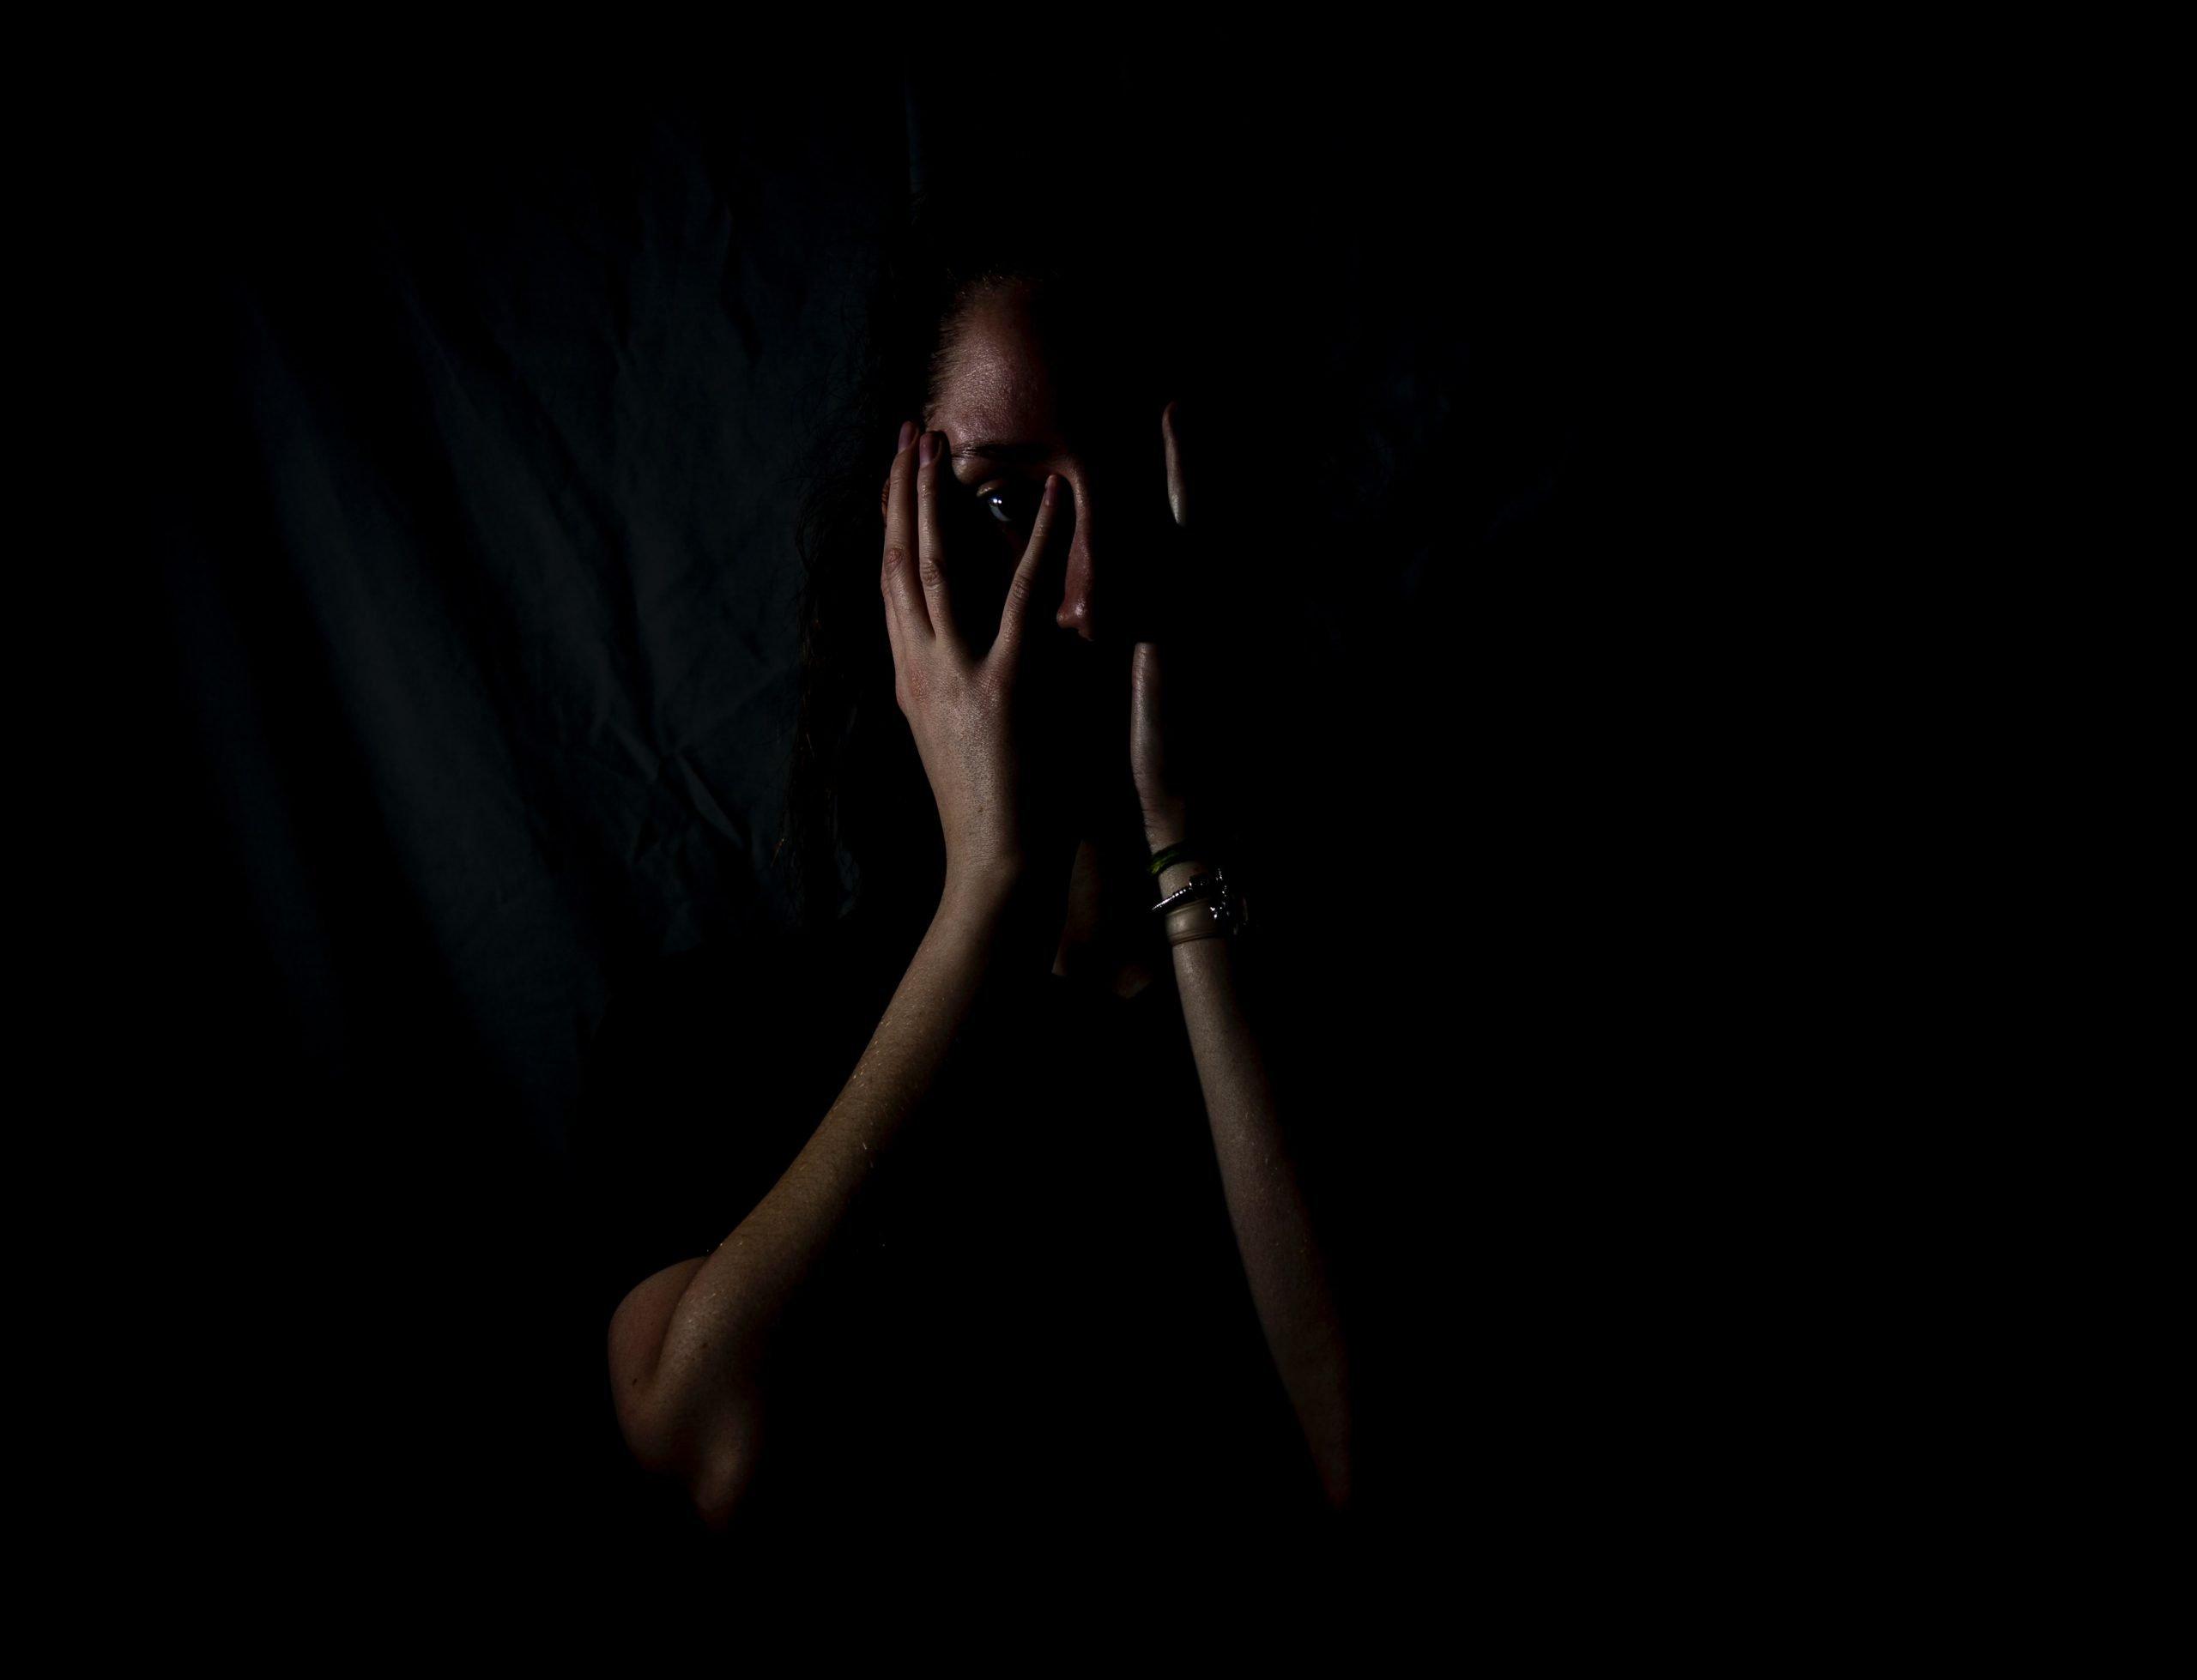 Desperation in Darkness